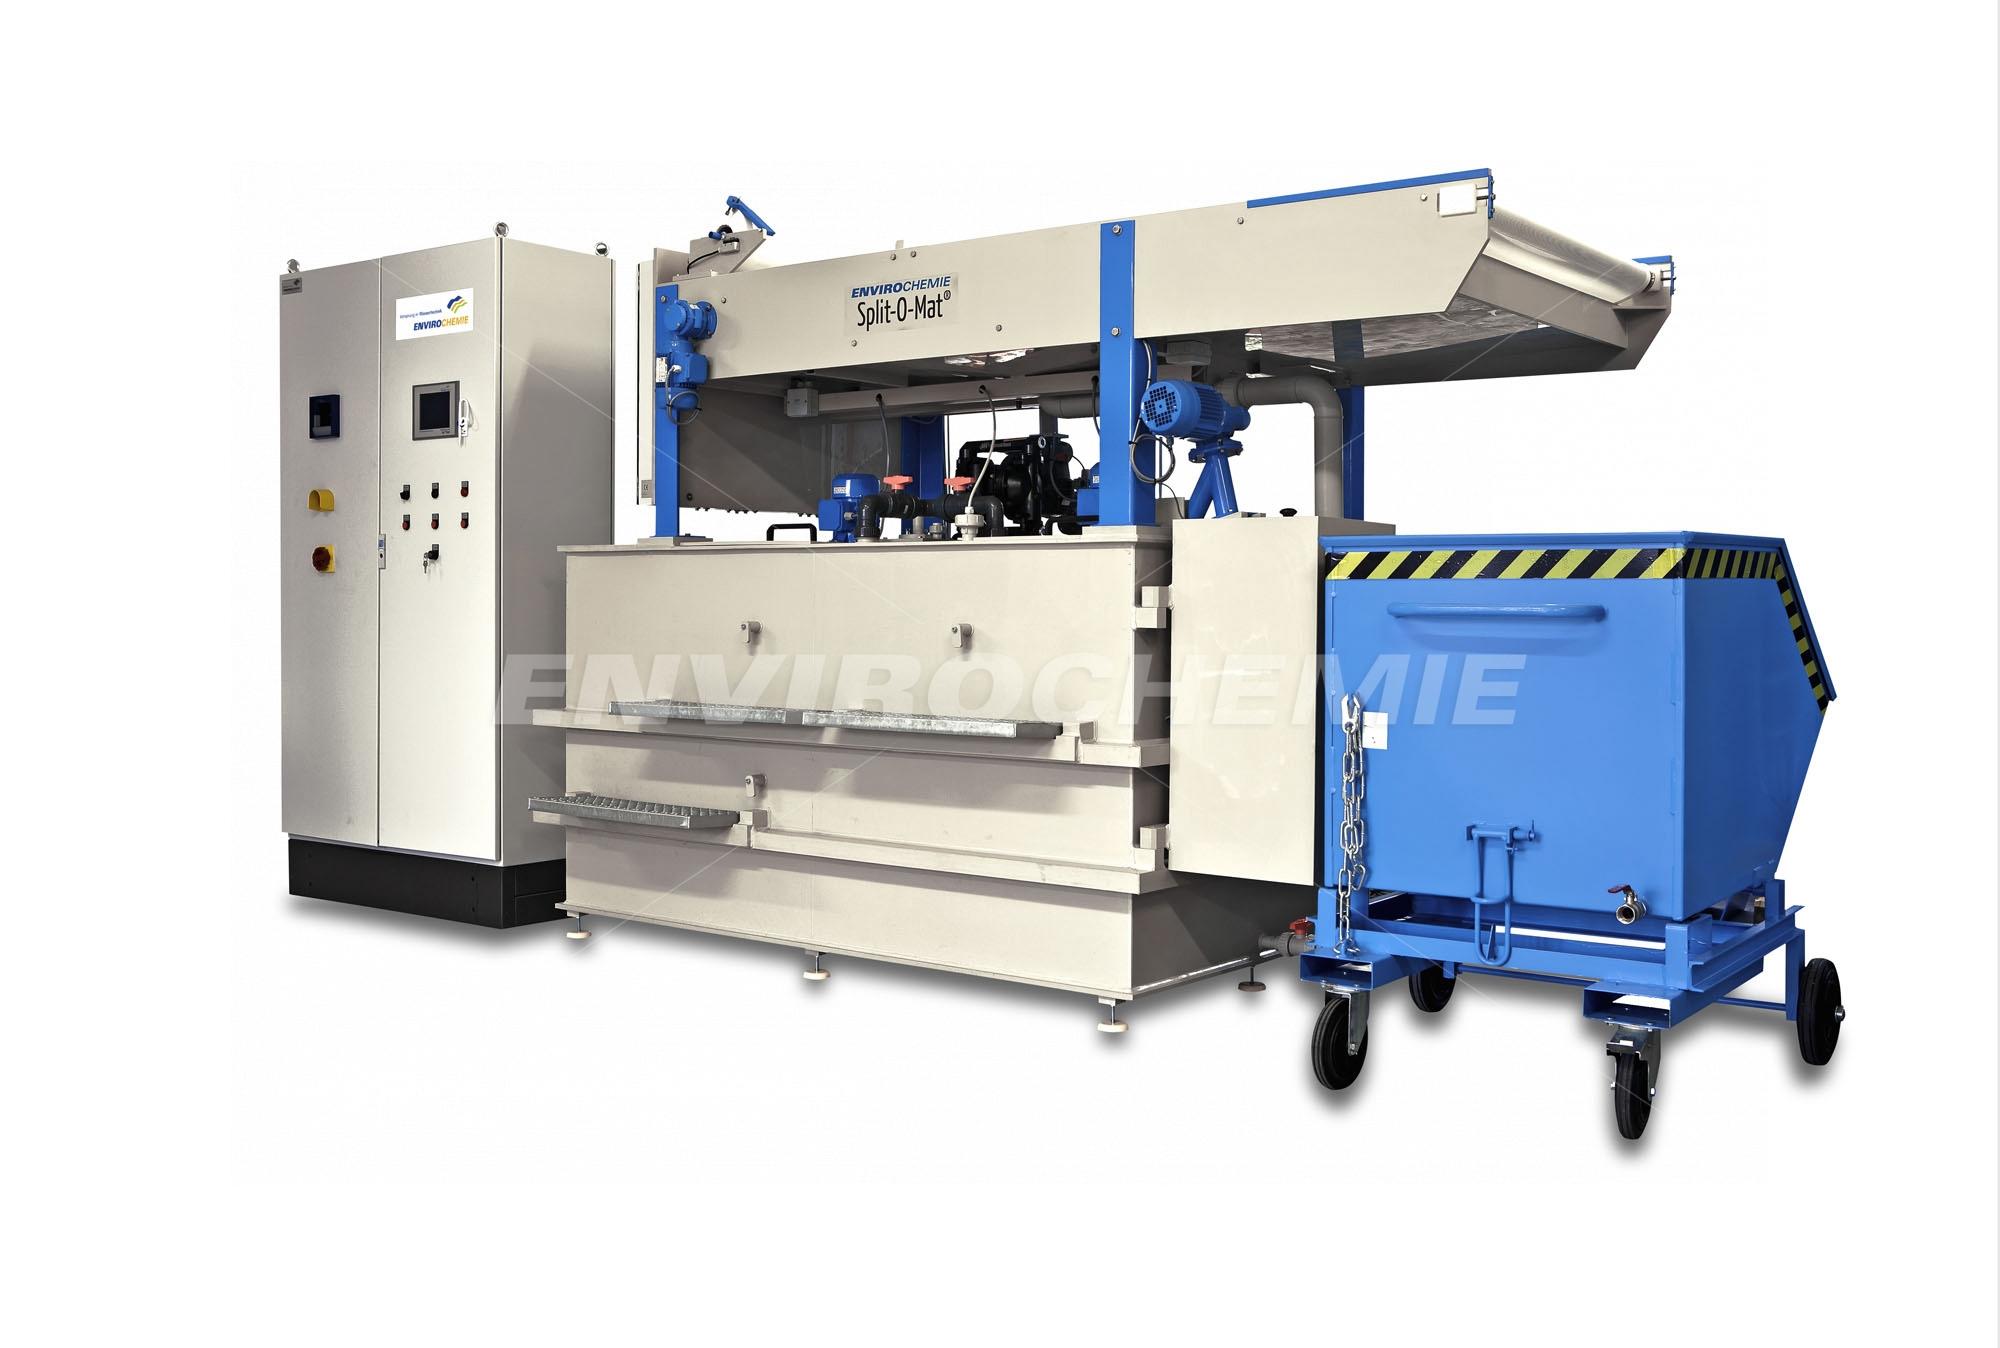 Split-O-Mat SOM 4200: Kompaktanlagekomplett mit